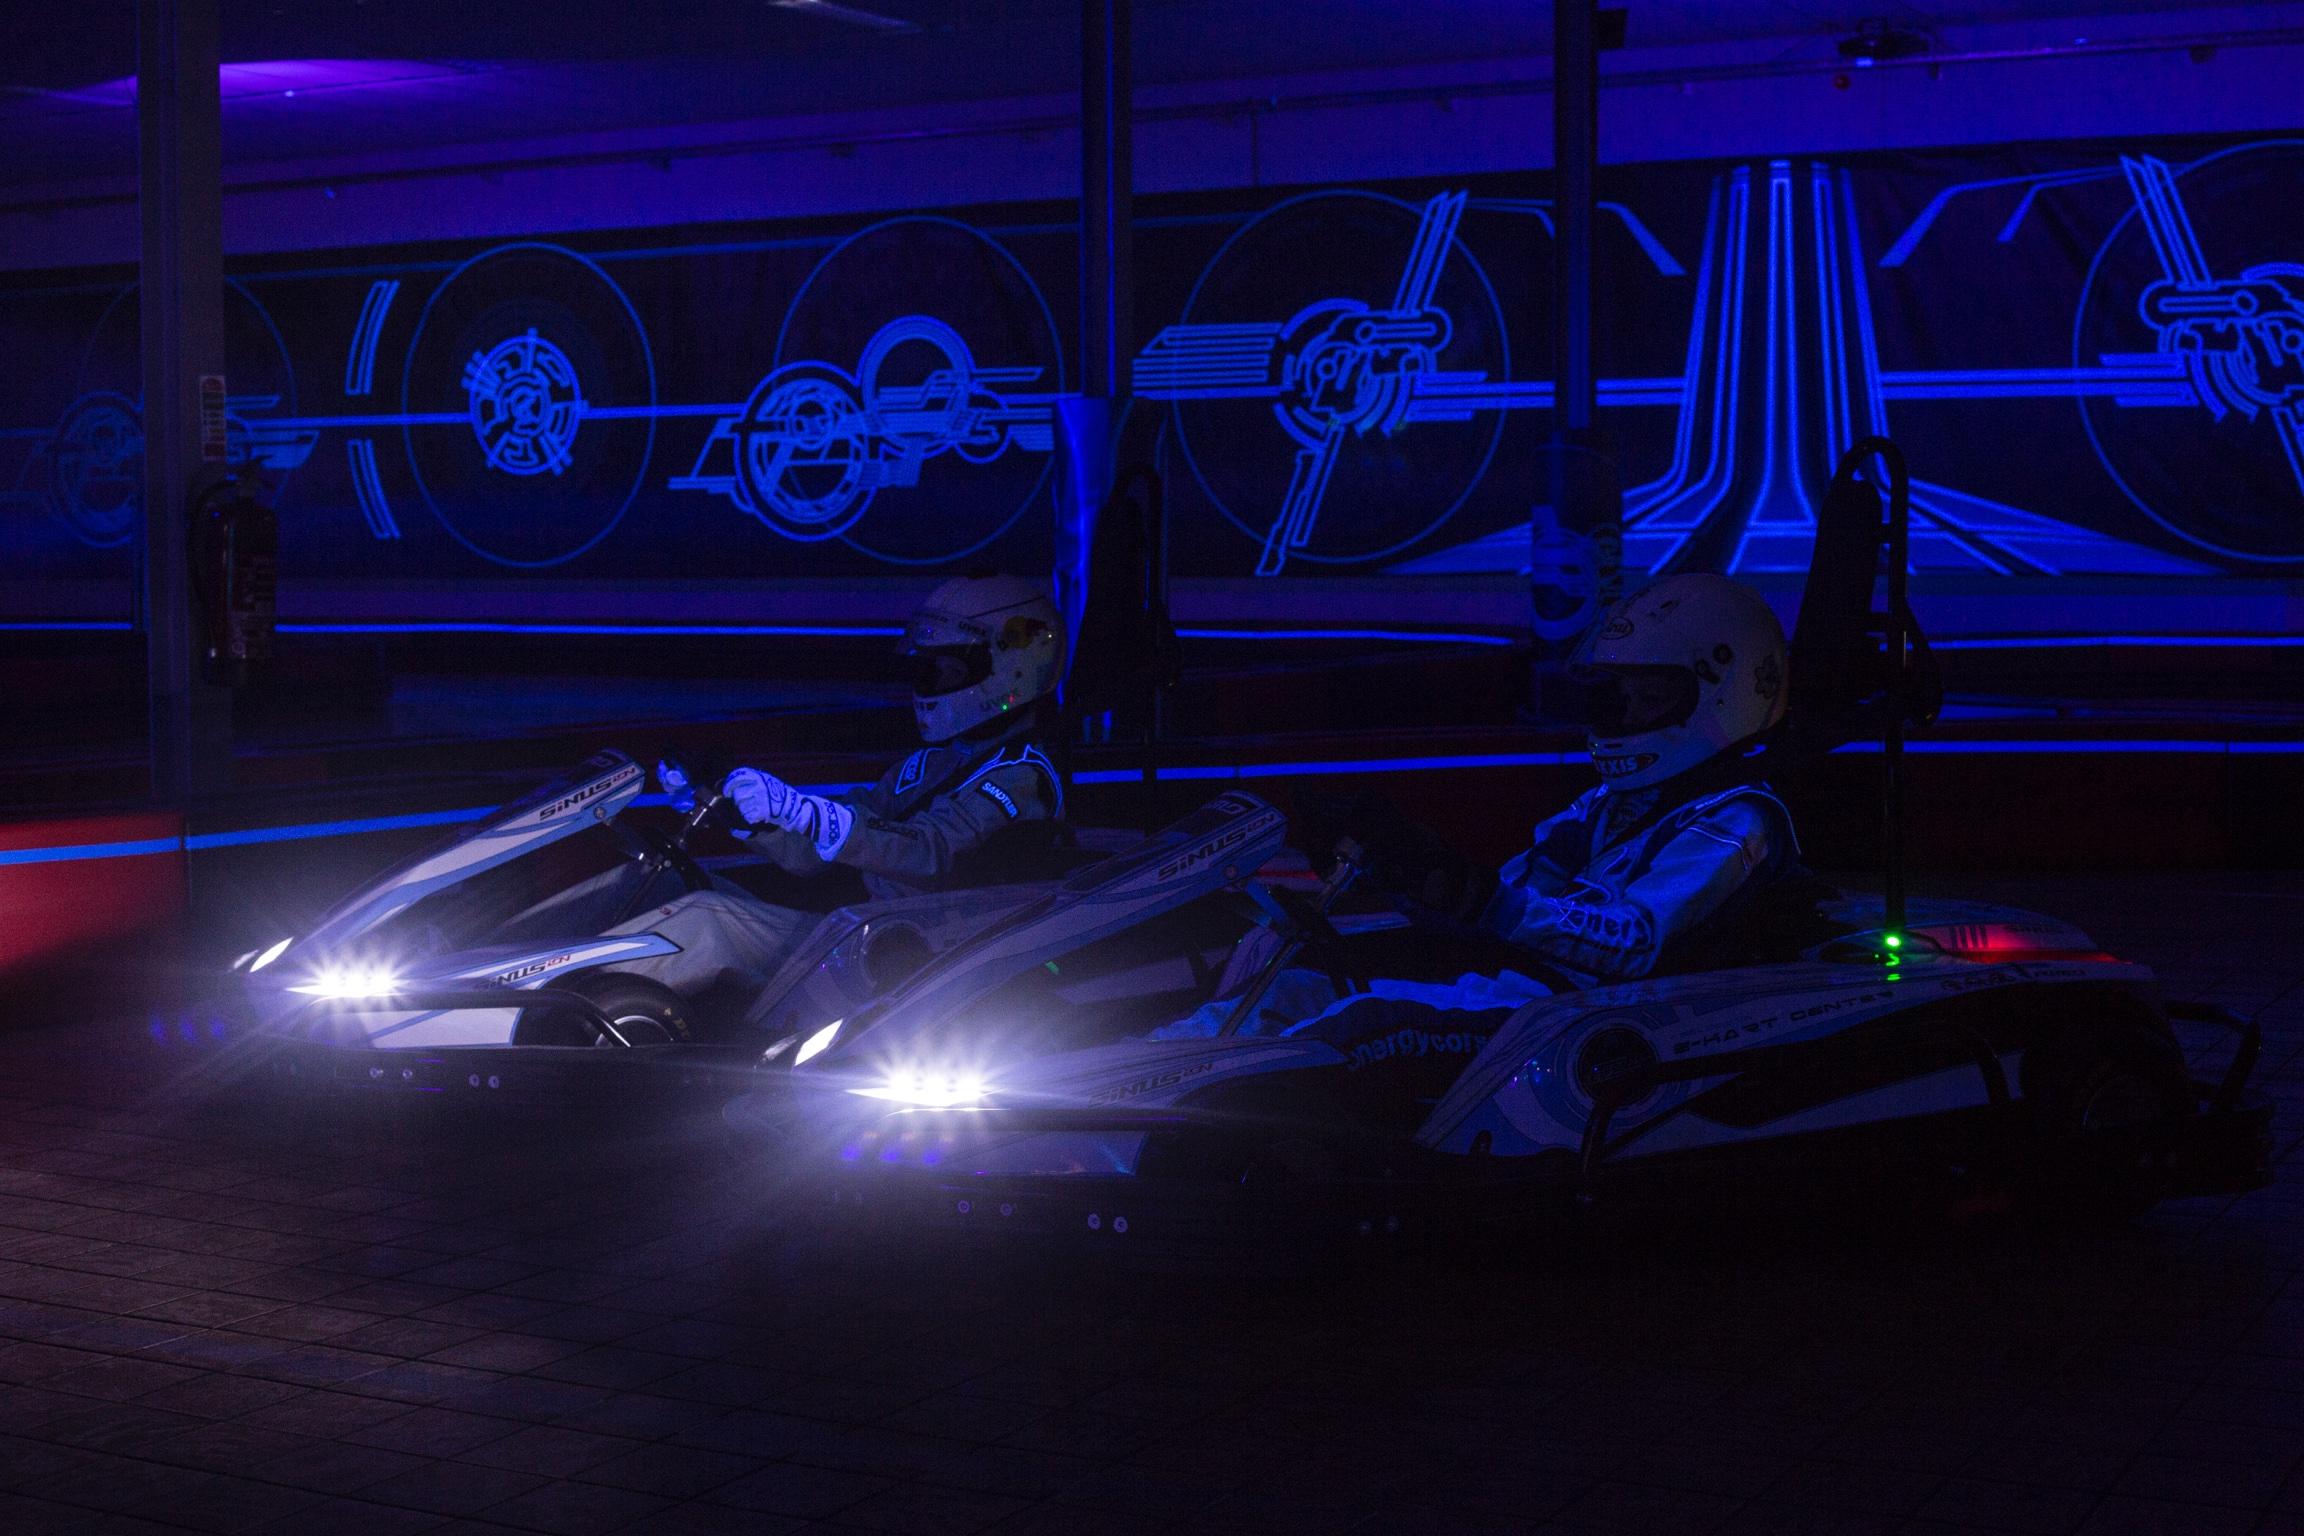 Laserspace Race karten in glow sfeer